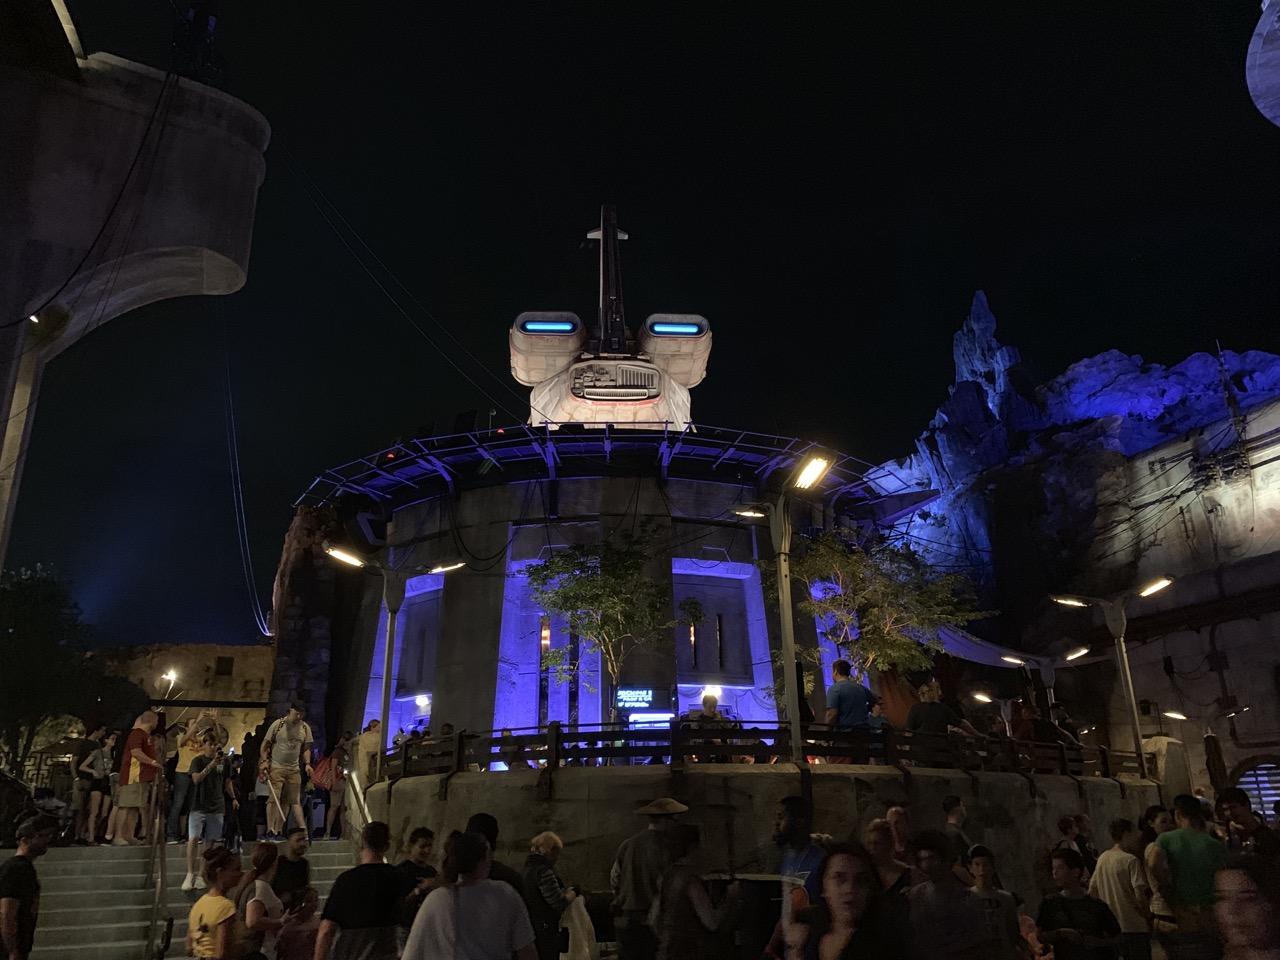 disney world swge opening trip report batuu night 04.jpeg